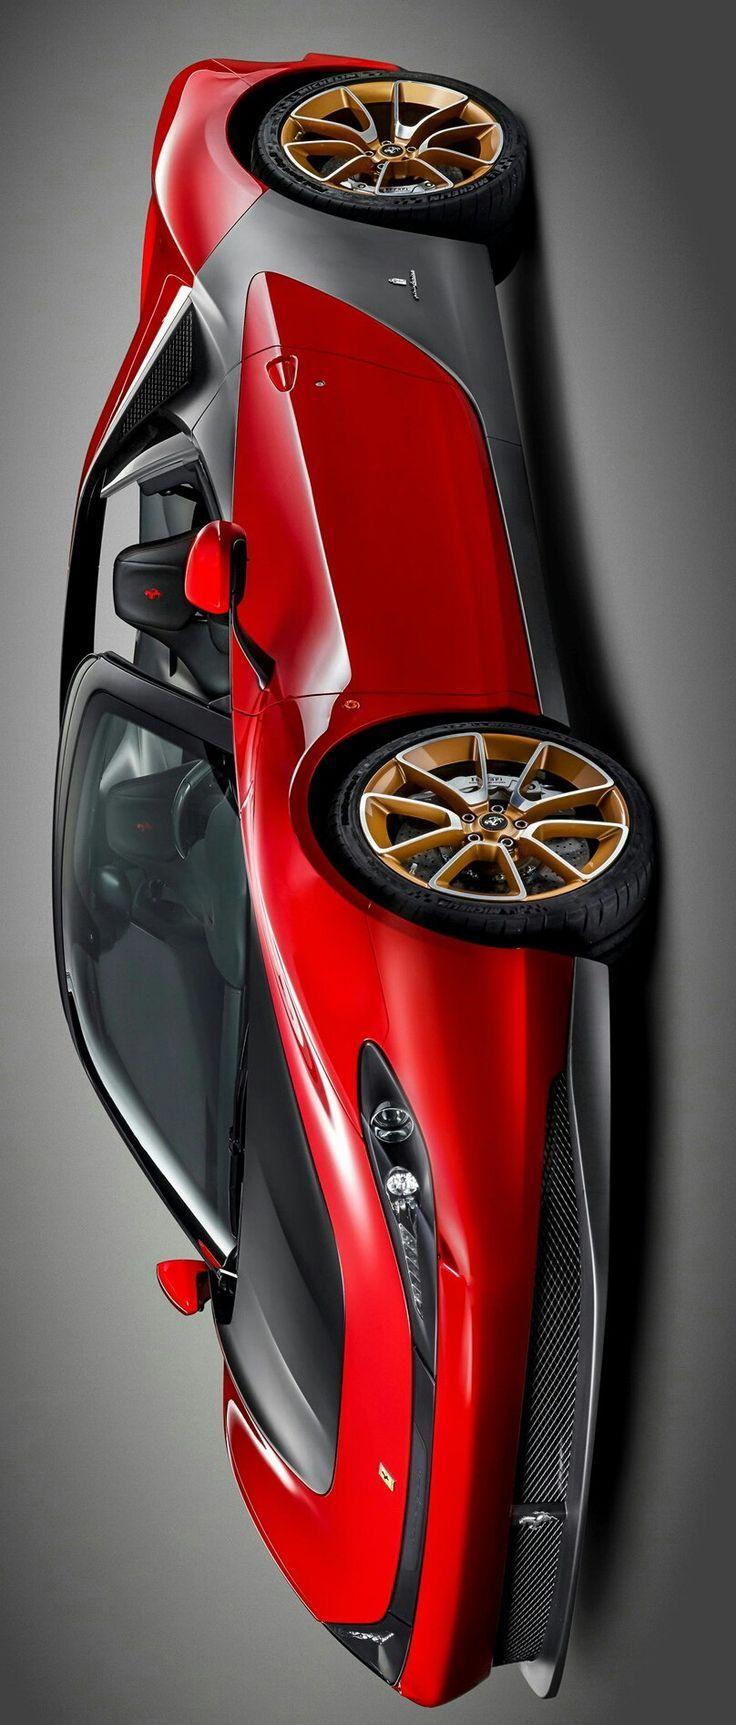 Sports car  - good image